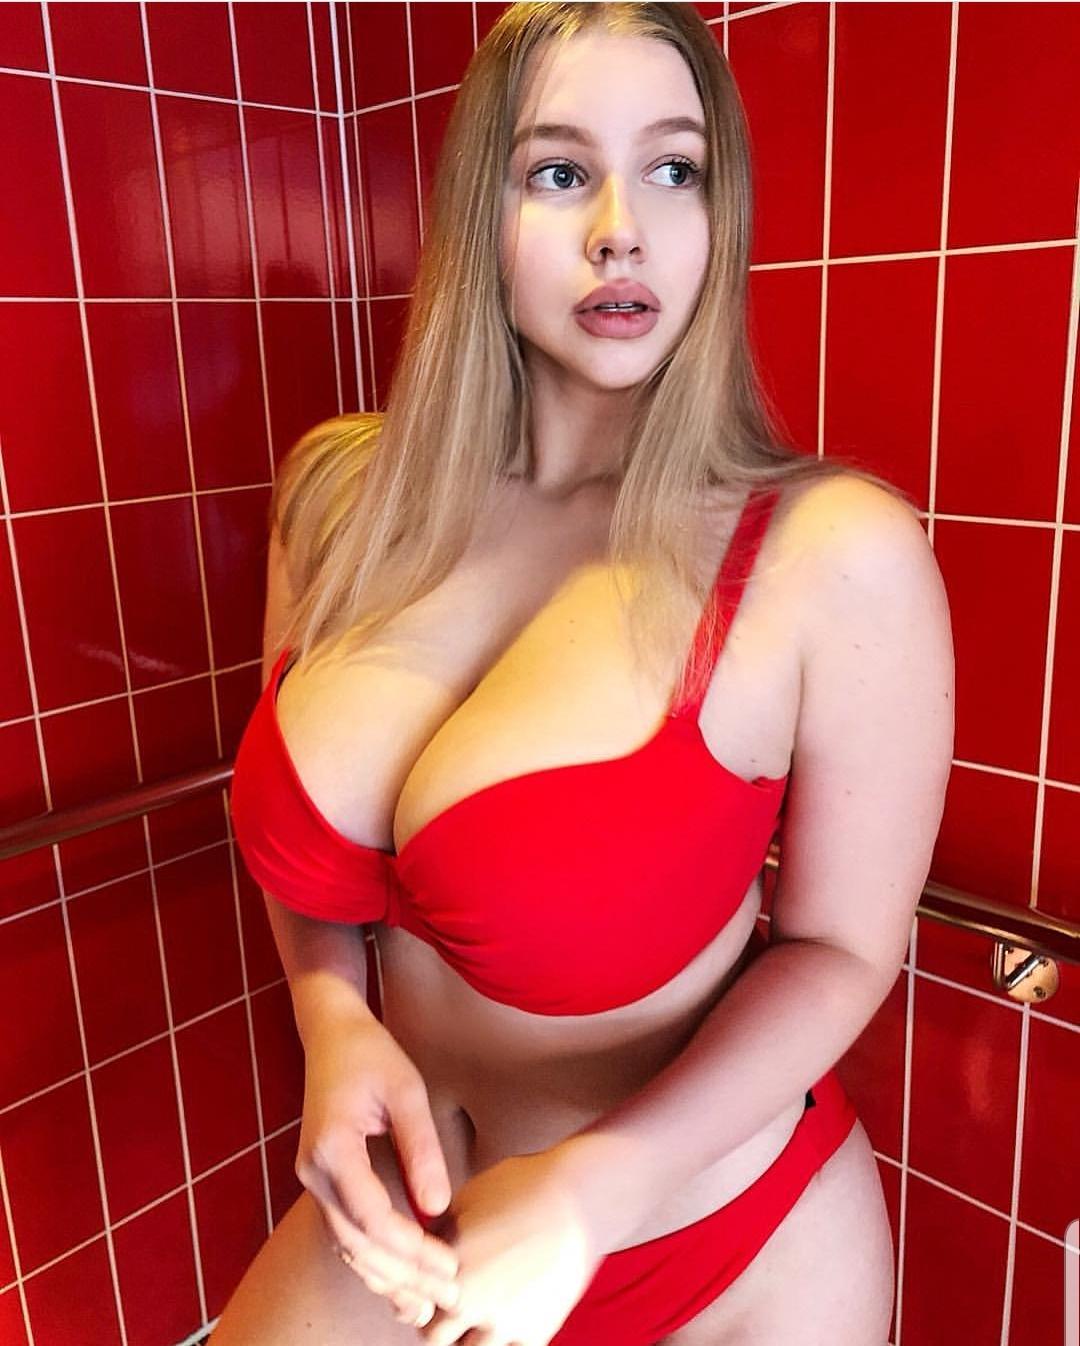 Queen Paraskeva Reddit photo 17